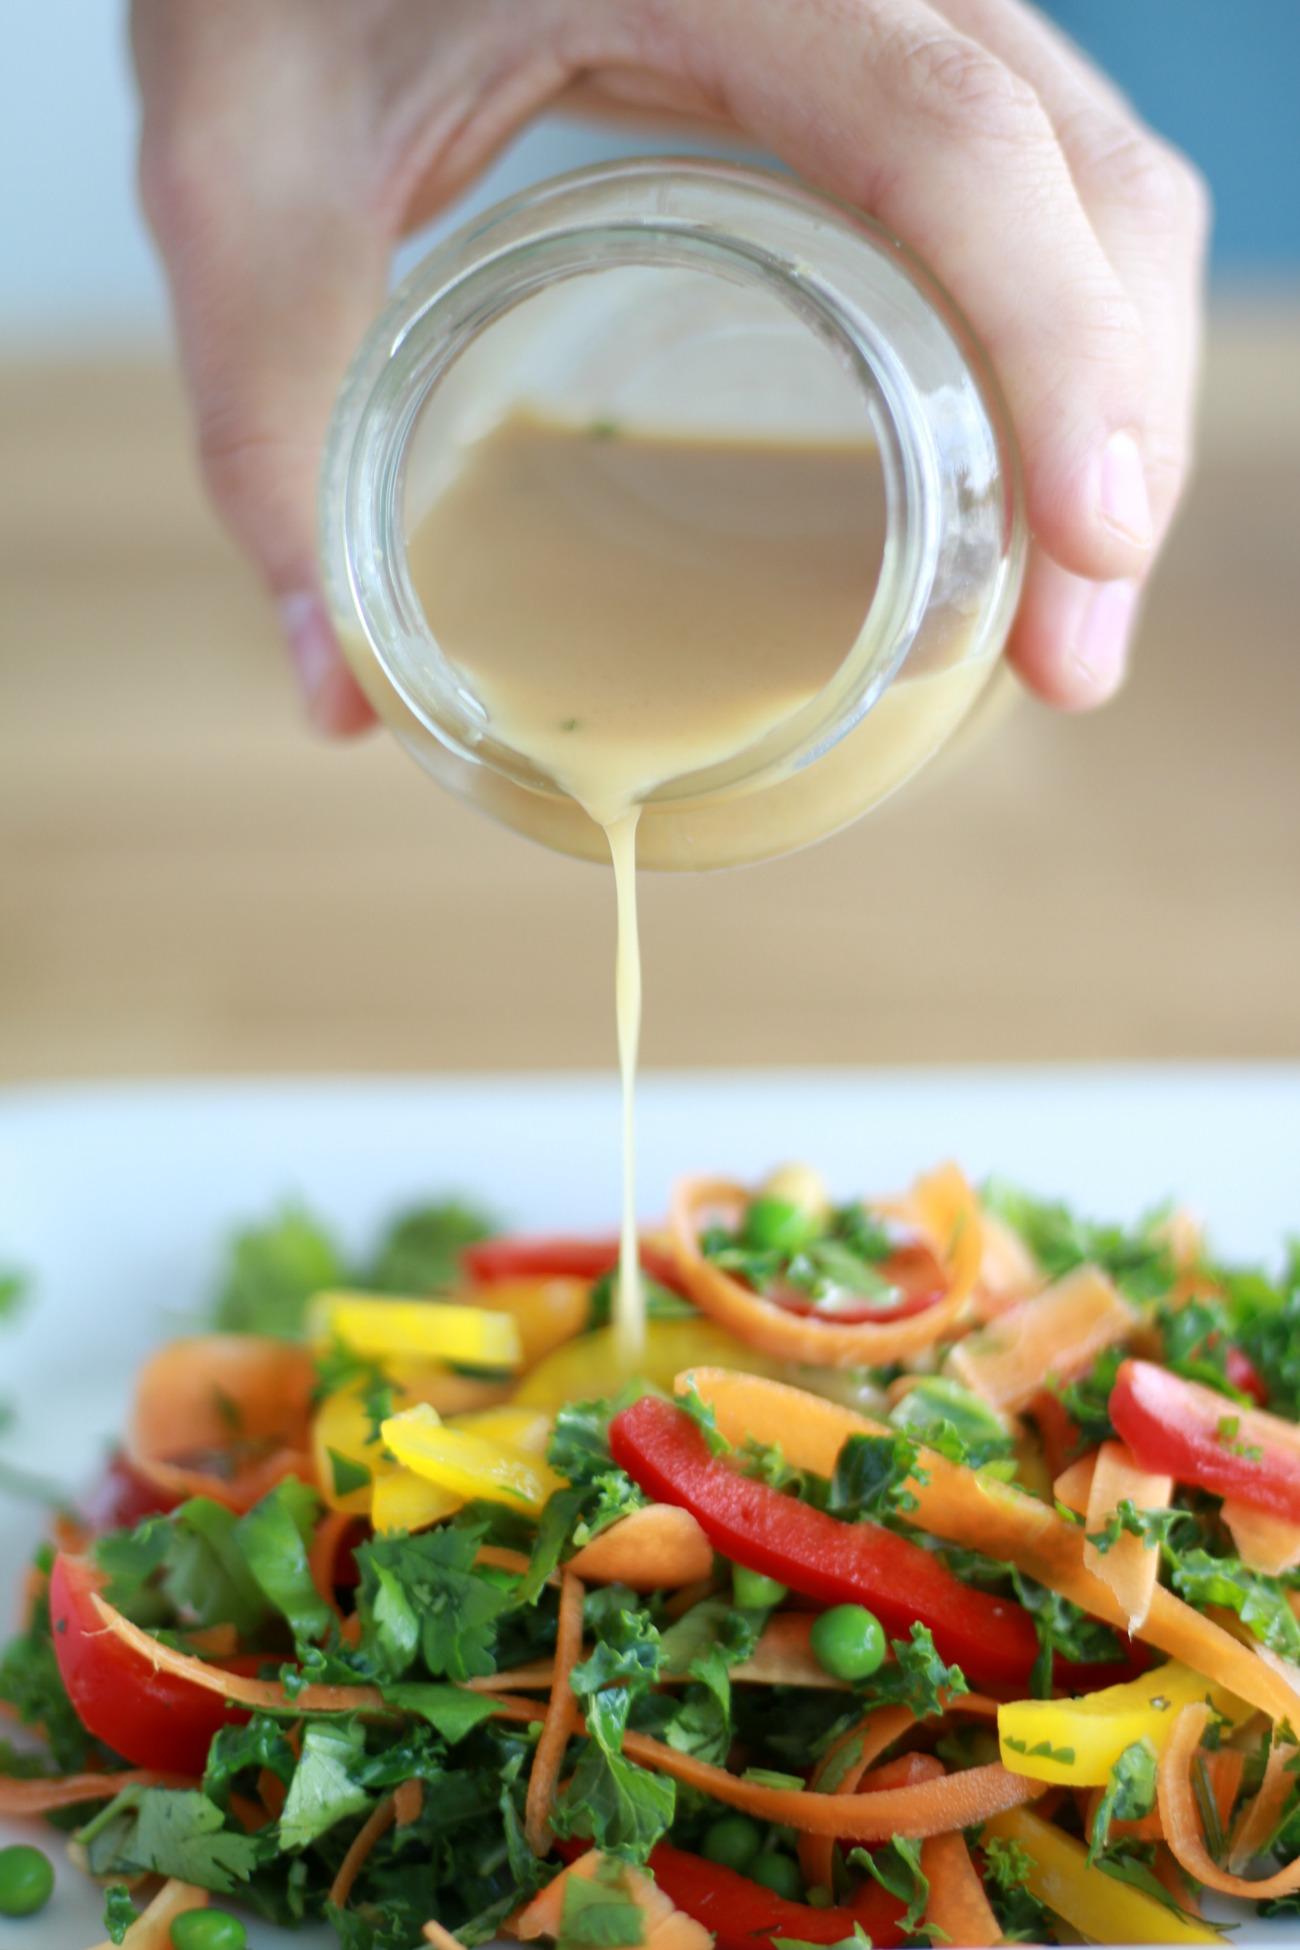 Thaise salade - gezonde salade